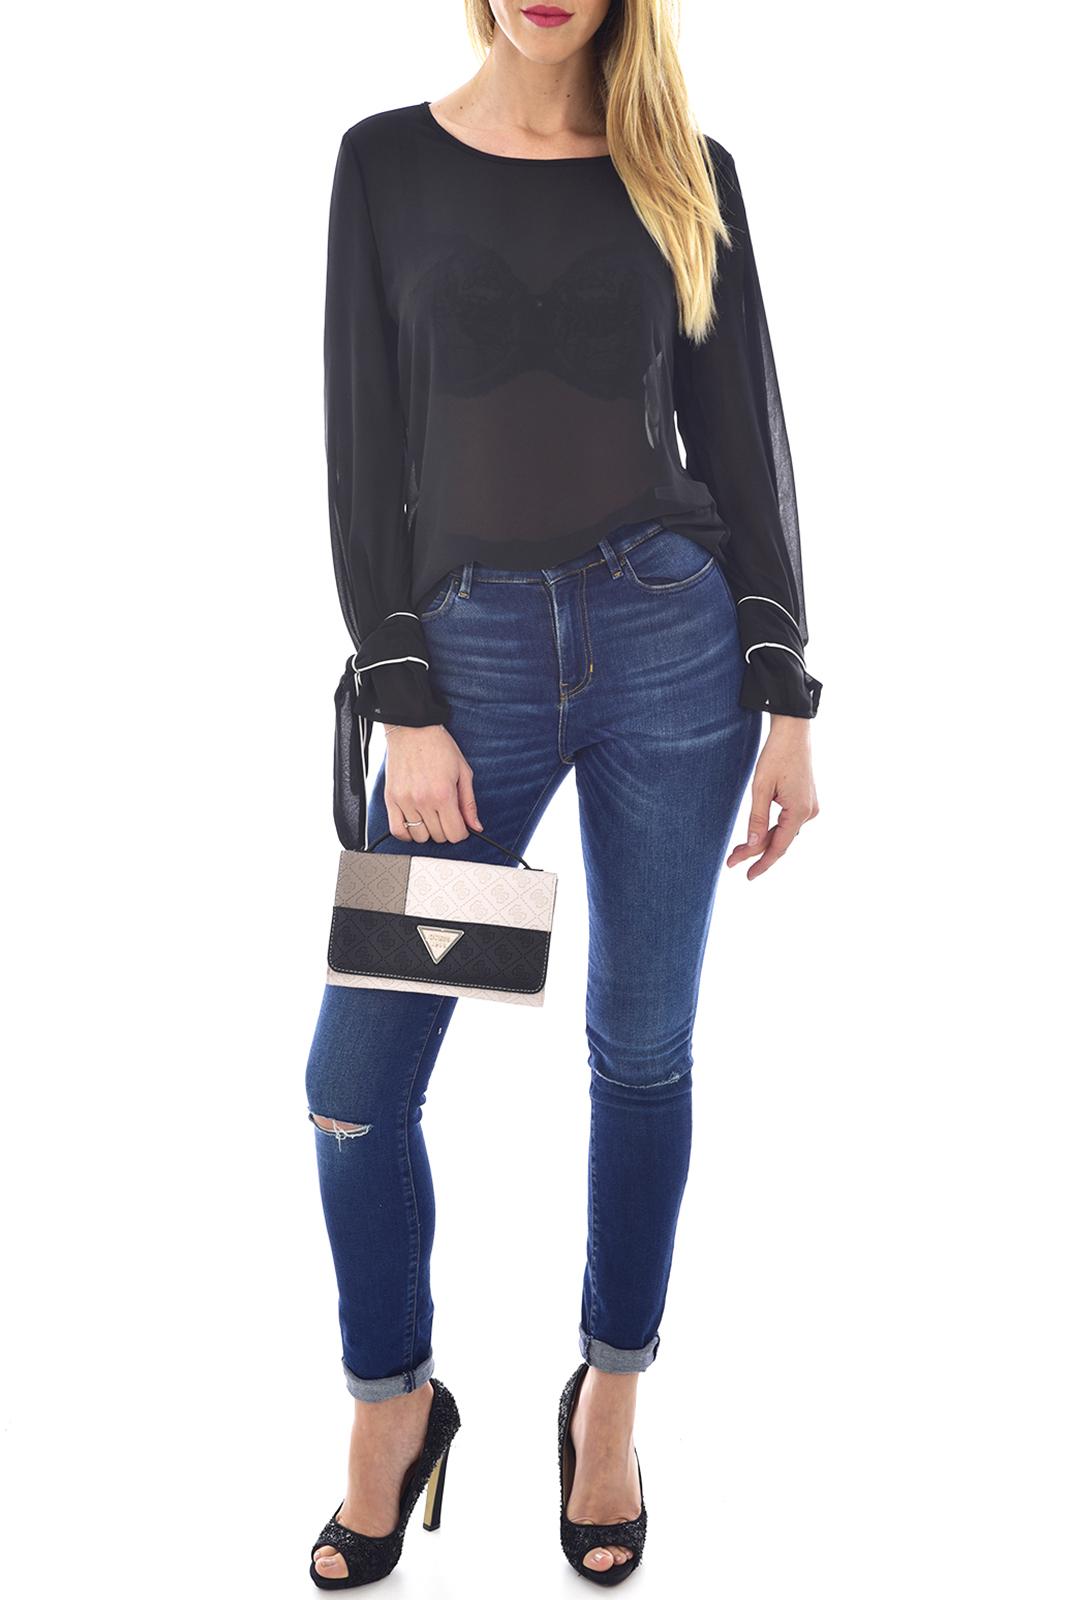 Pochettes  Guess jeans HWCV66 91790 BLACK MULTI